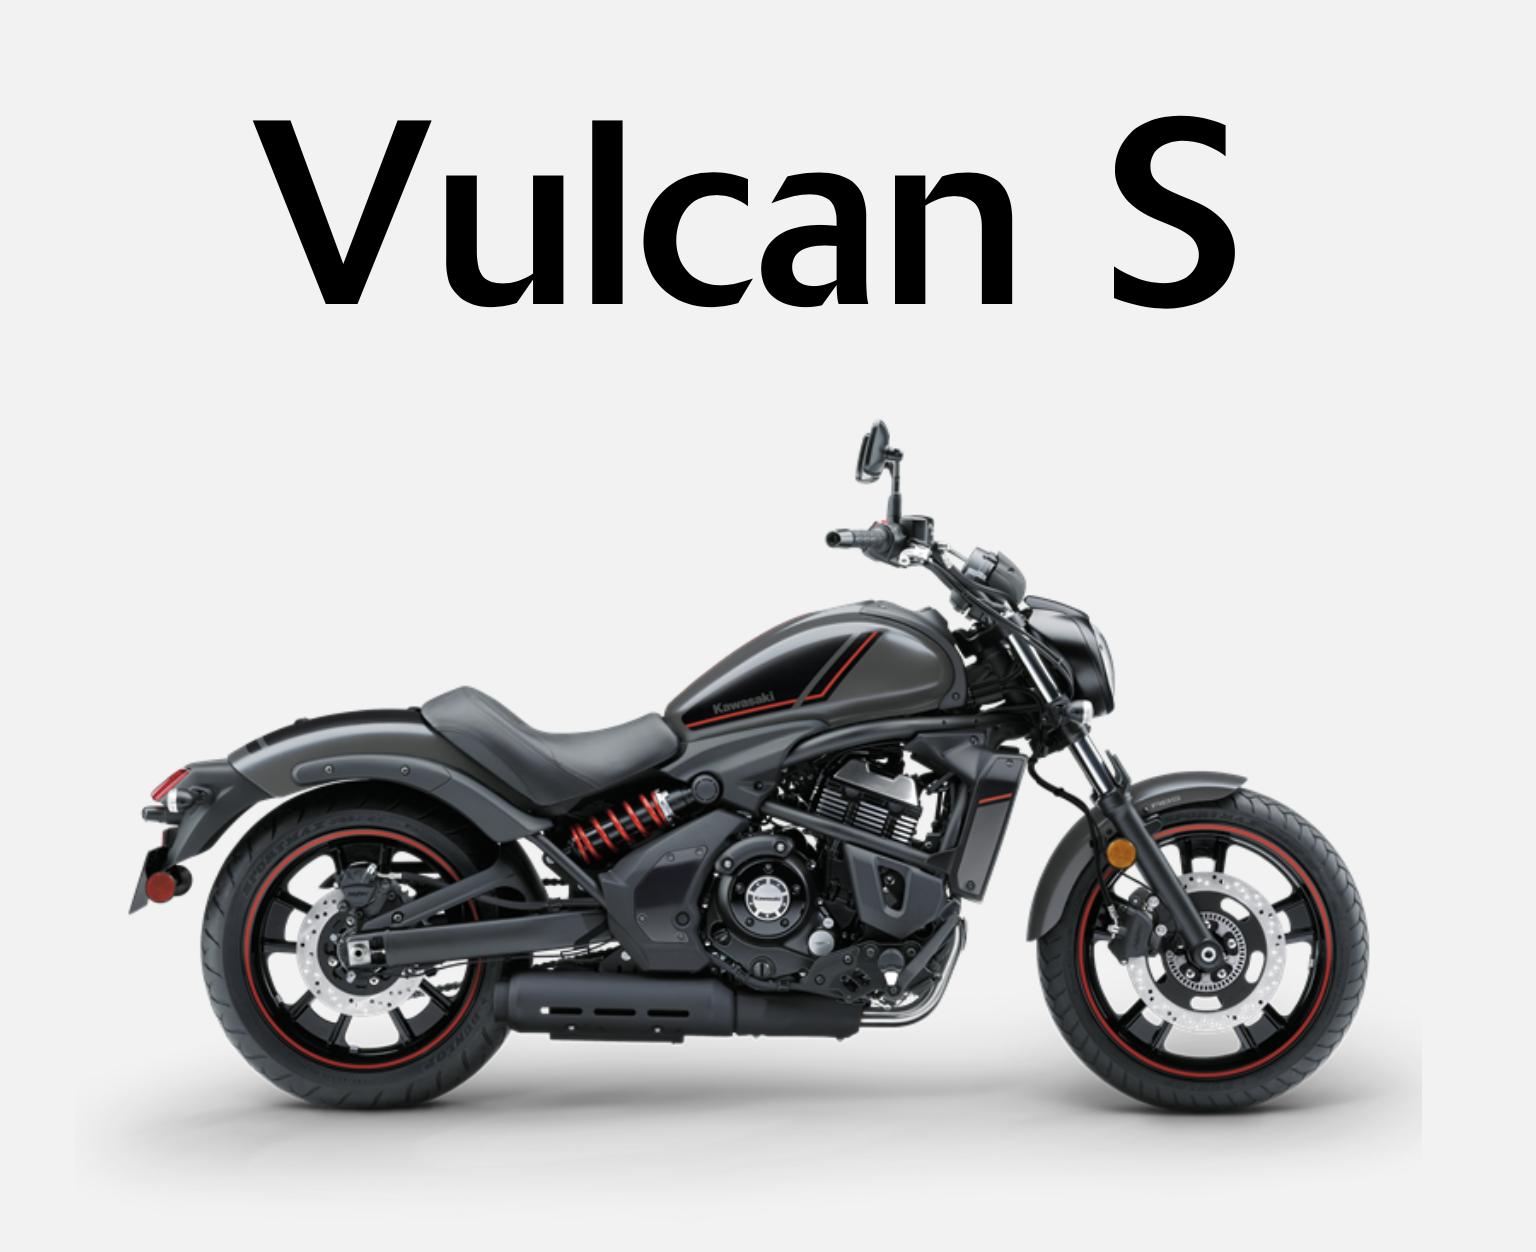 Vulcan S NERA 2020 REBUSCHI TREVISO